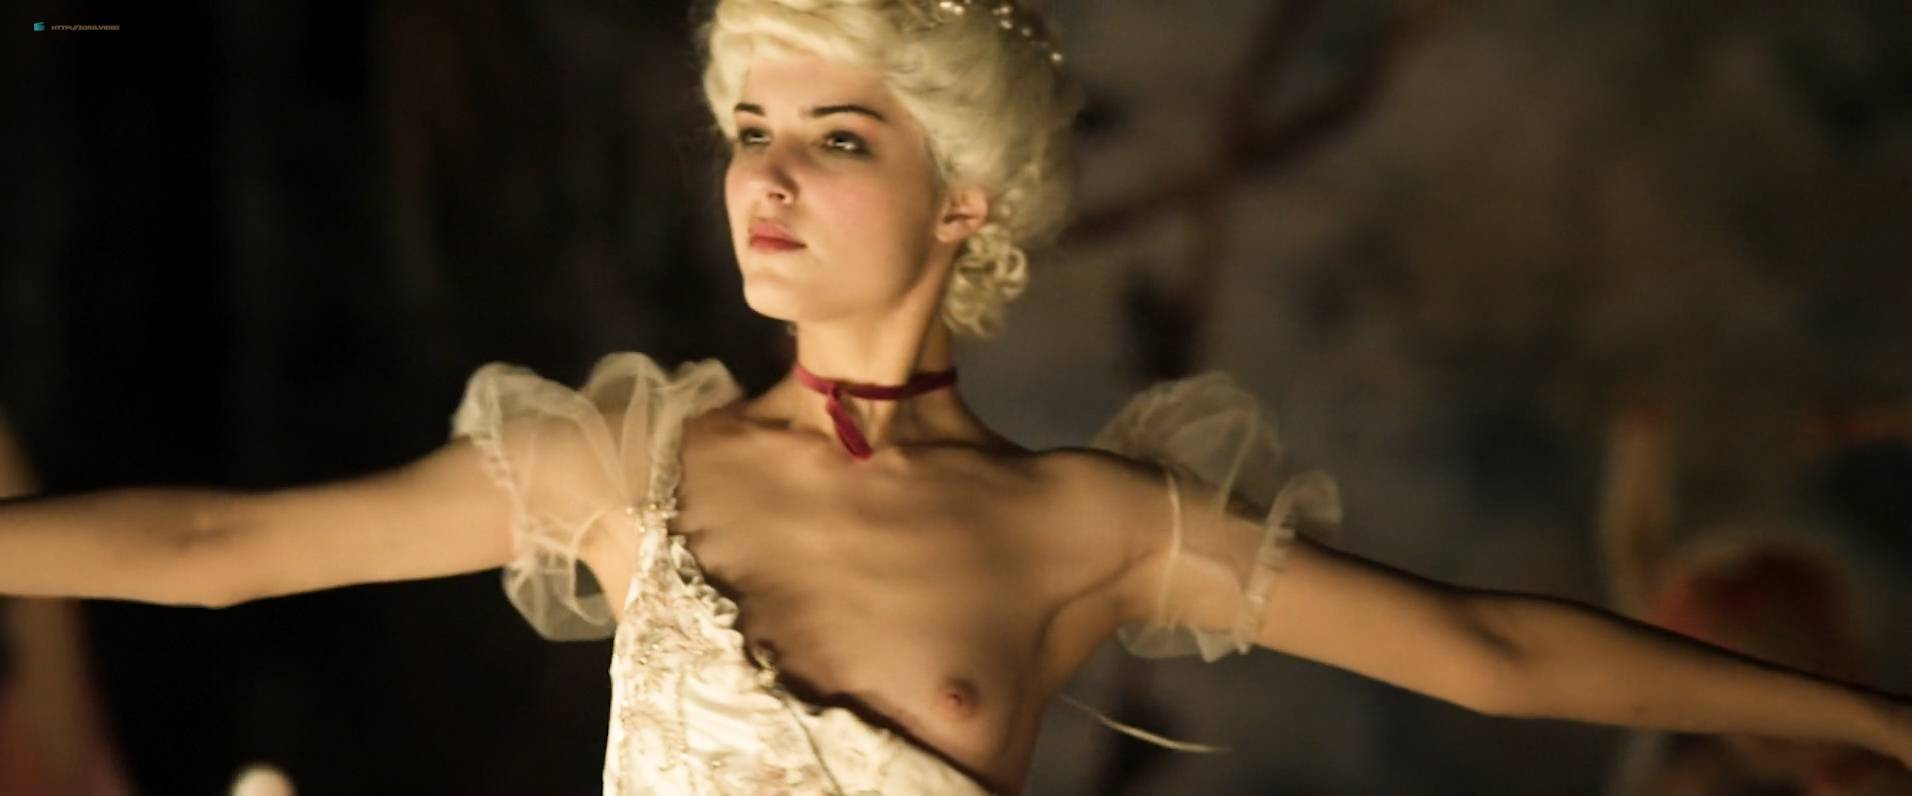 Michalina-Olszanska-nude-topless-Matilda-RU-2017-HD-1080p-WEb-002.jpg